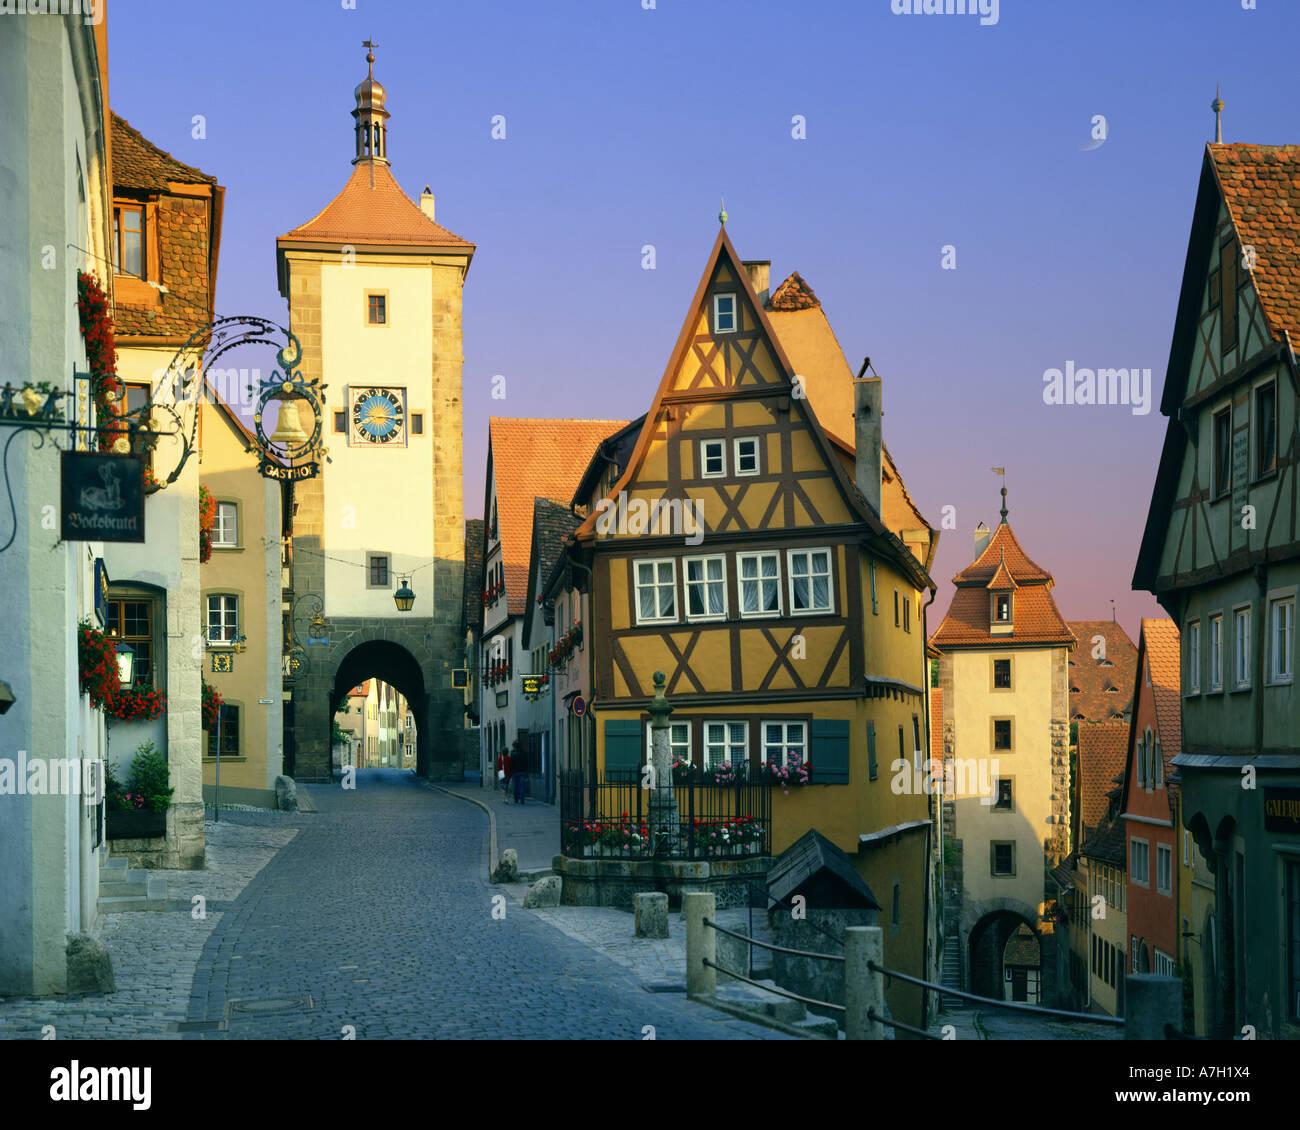 DE - Baviera: Plönlein a Rothenburg-ob-der-Tauber Imagen De Stock